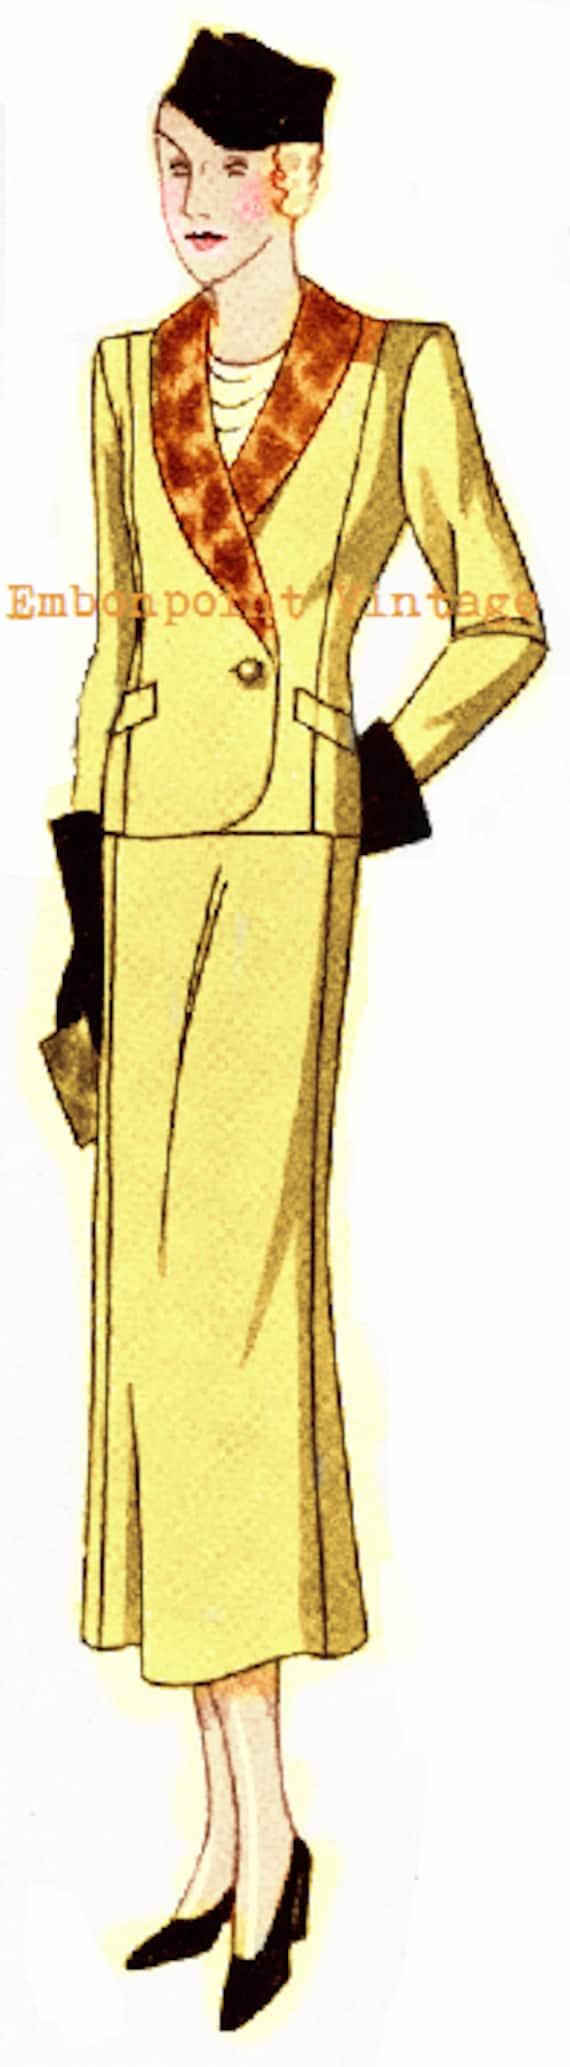 1930s House Dresses Plus Size (or any size) 1934 Vintage Suit Ensemble Sewing Pattern - PDF - Pattern No 76 Earnestine 1930s 30s Patterns Instant Download  AT vintagedancer.com